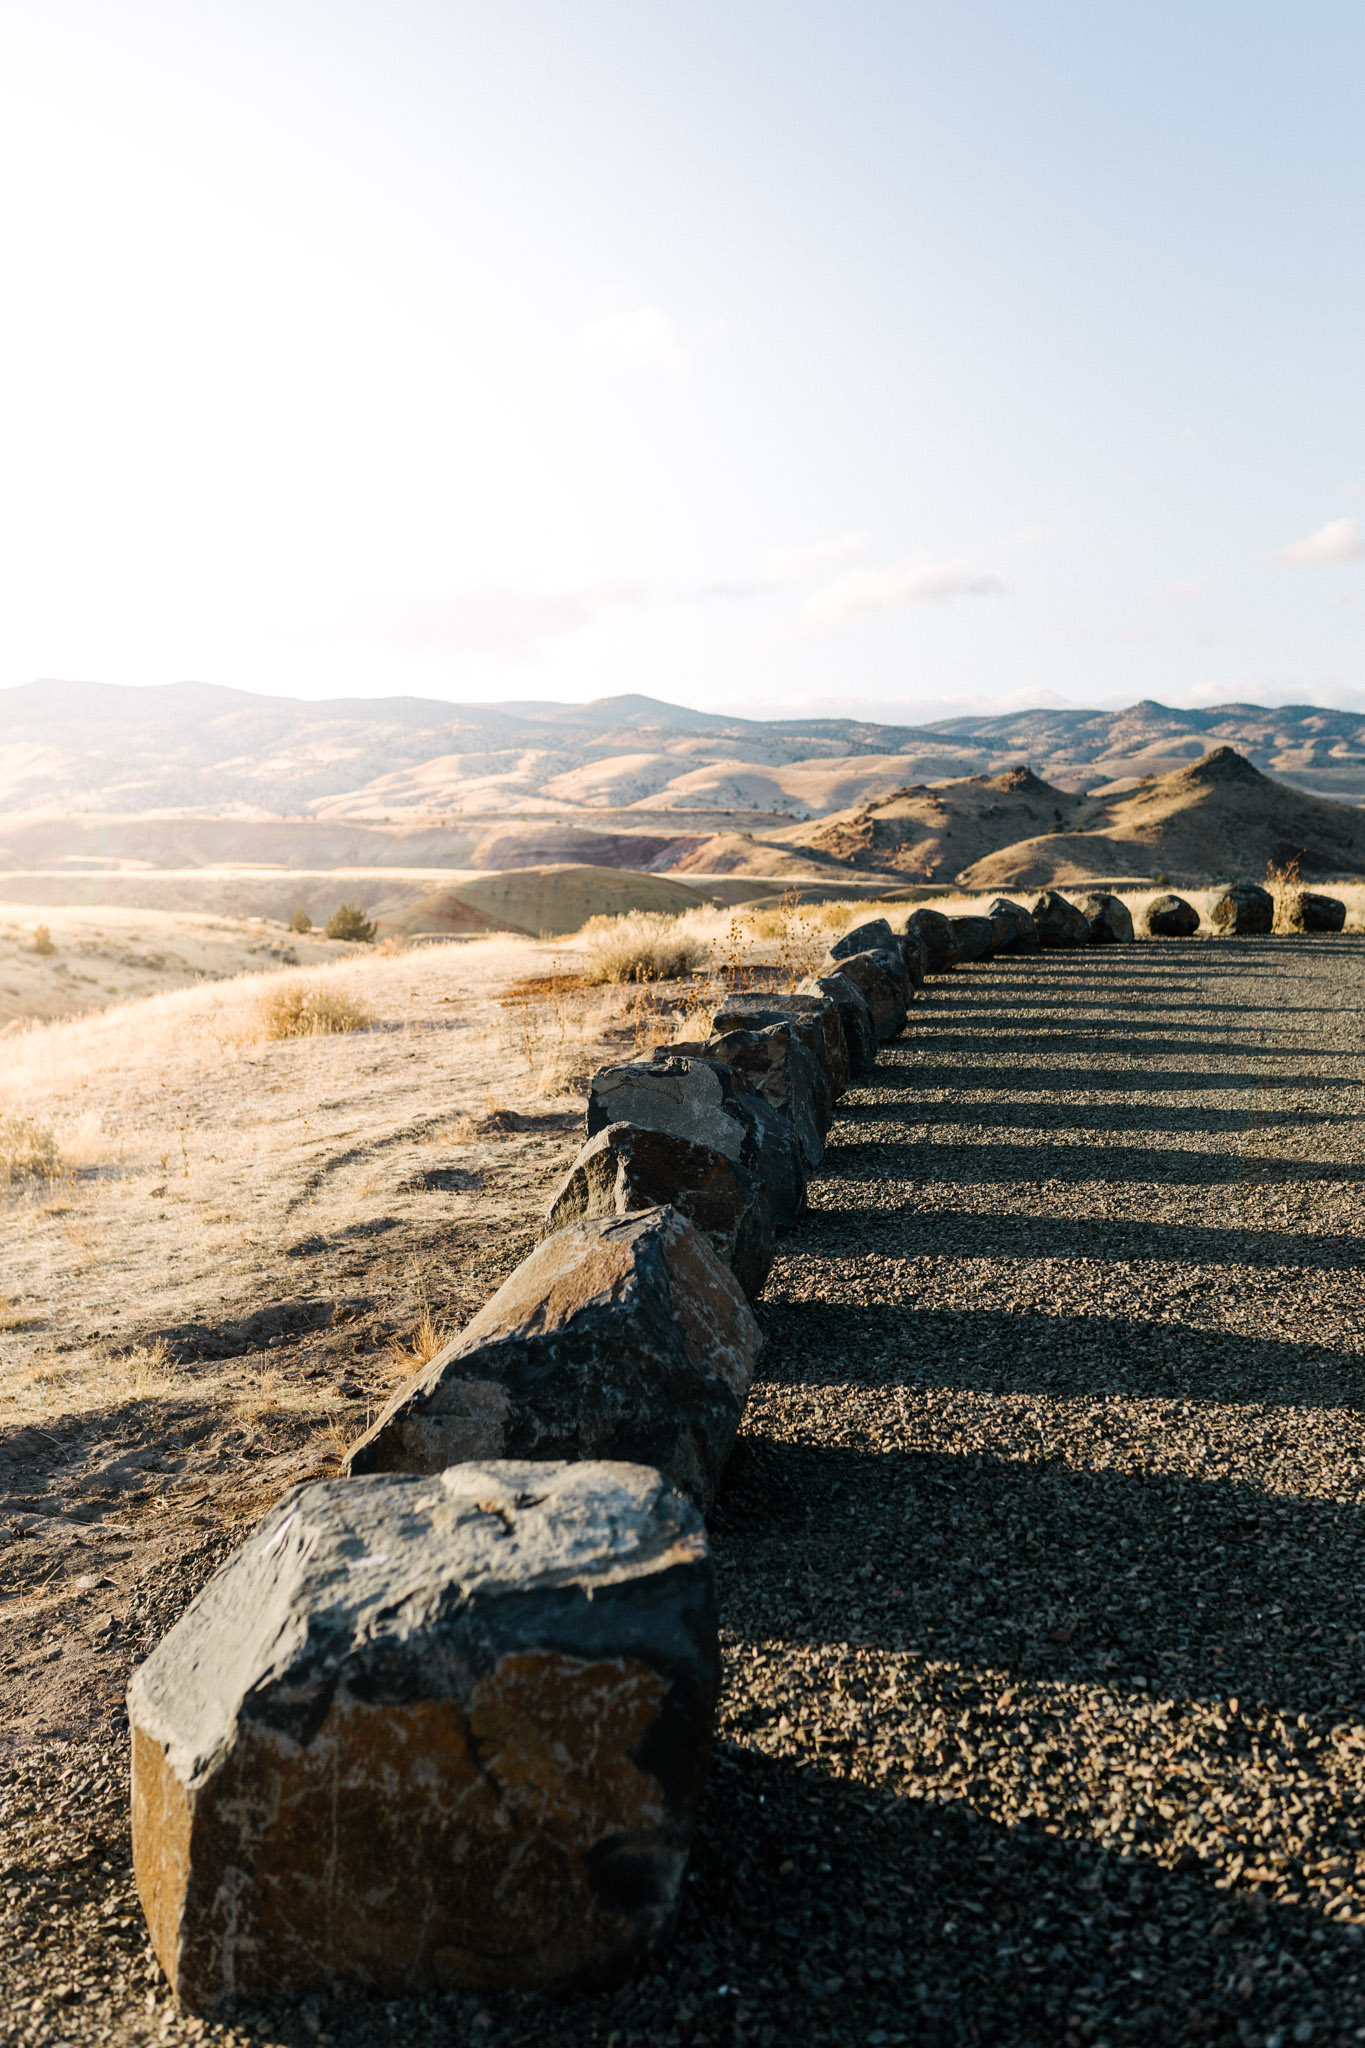 Oregon-Painted-Hills-Engagement-Pia-Anna-Christian-Wedding-Photography-LB-56.jpg